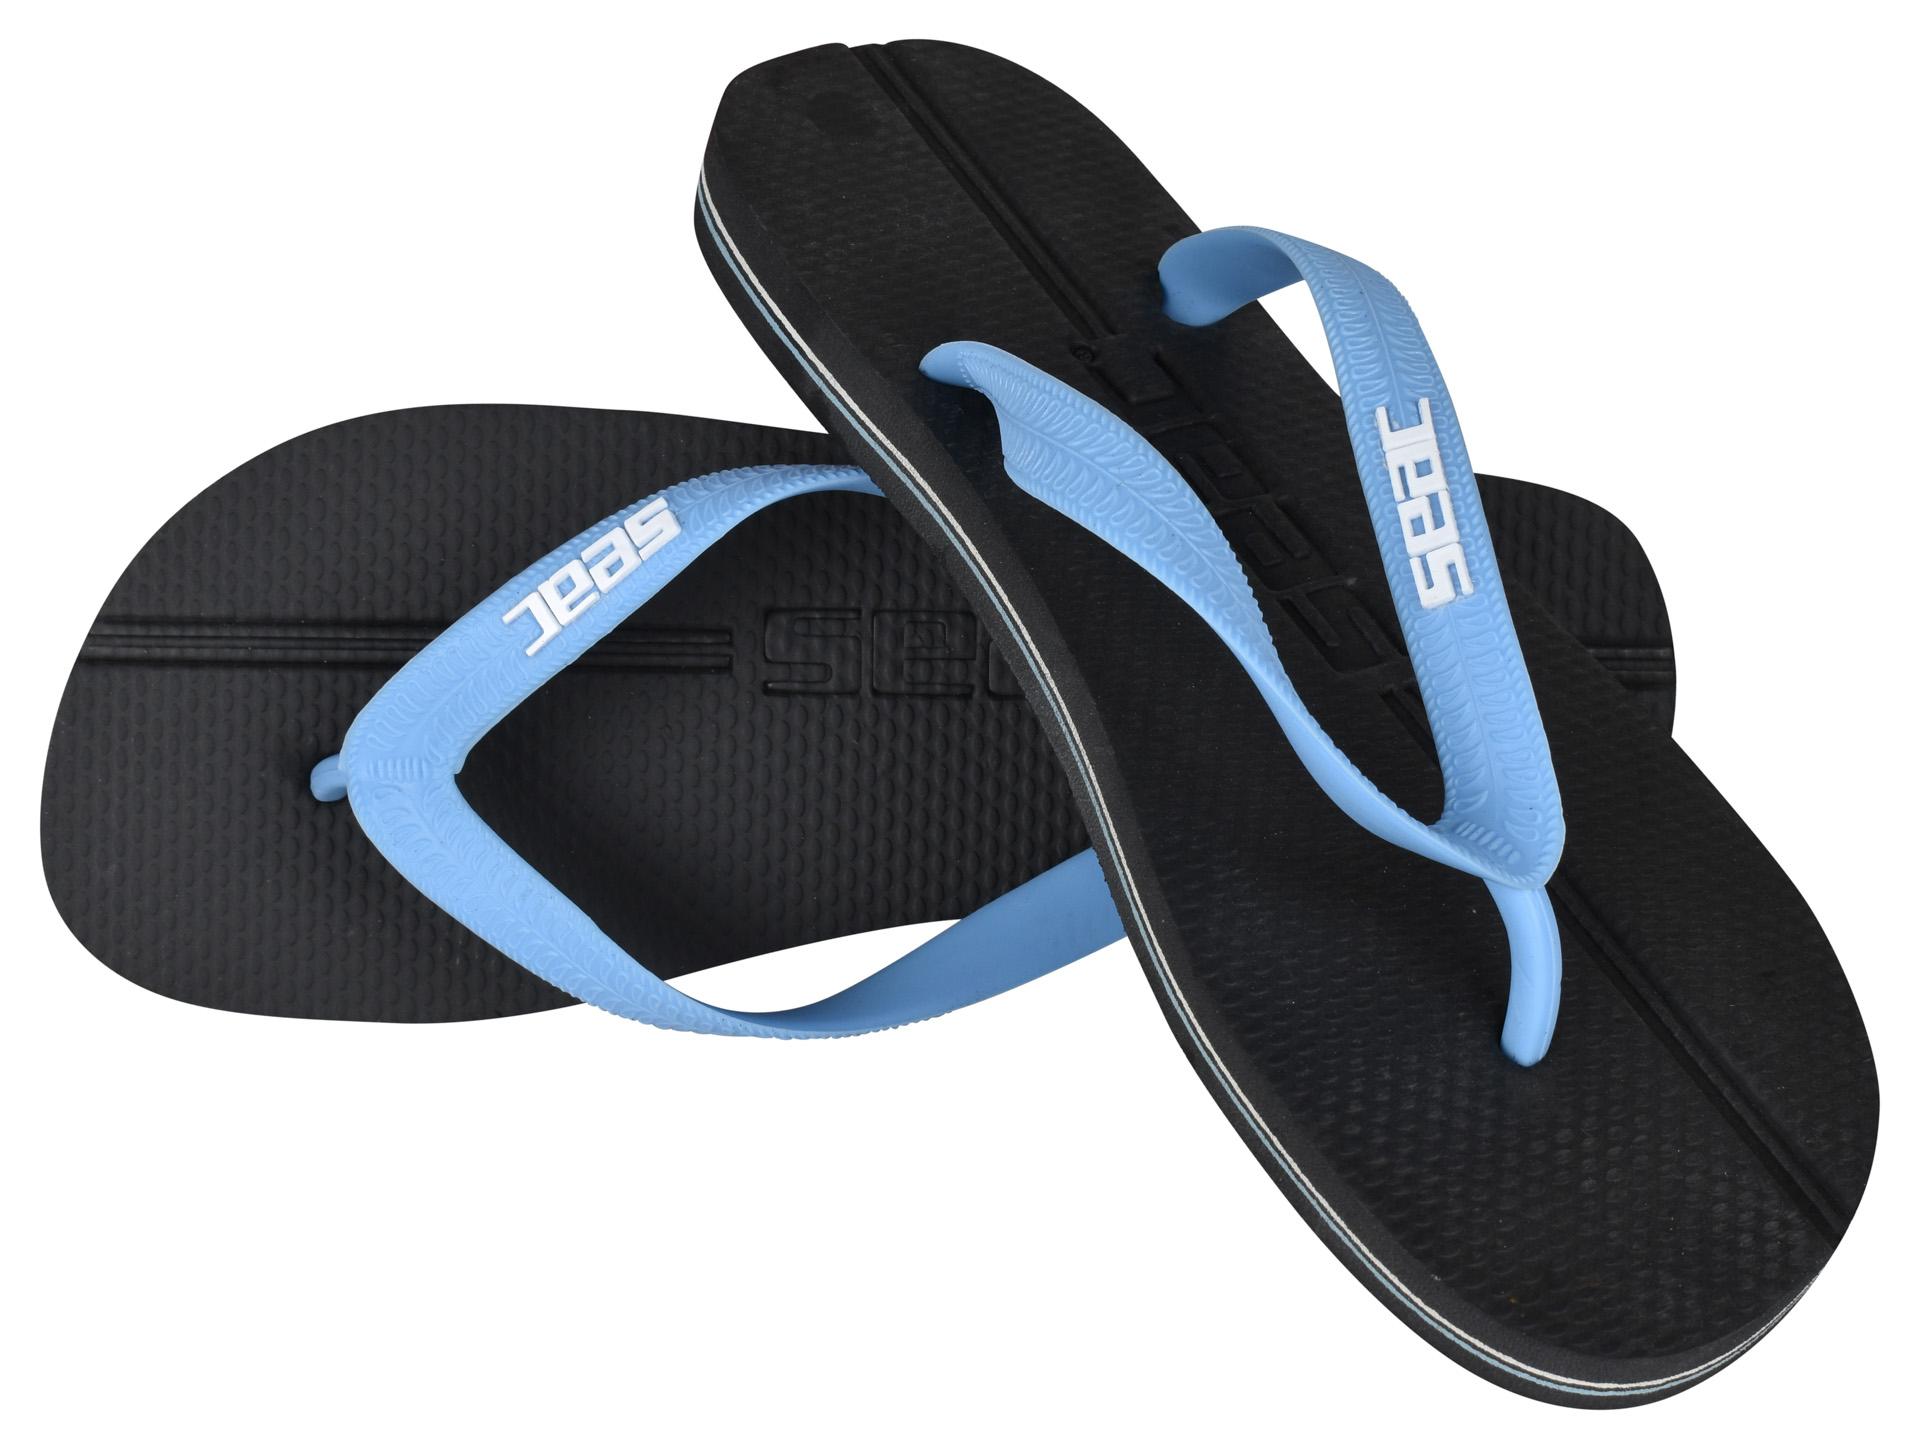 Seac Flip Flop Maui blau